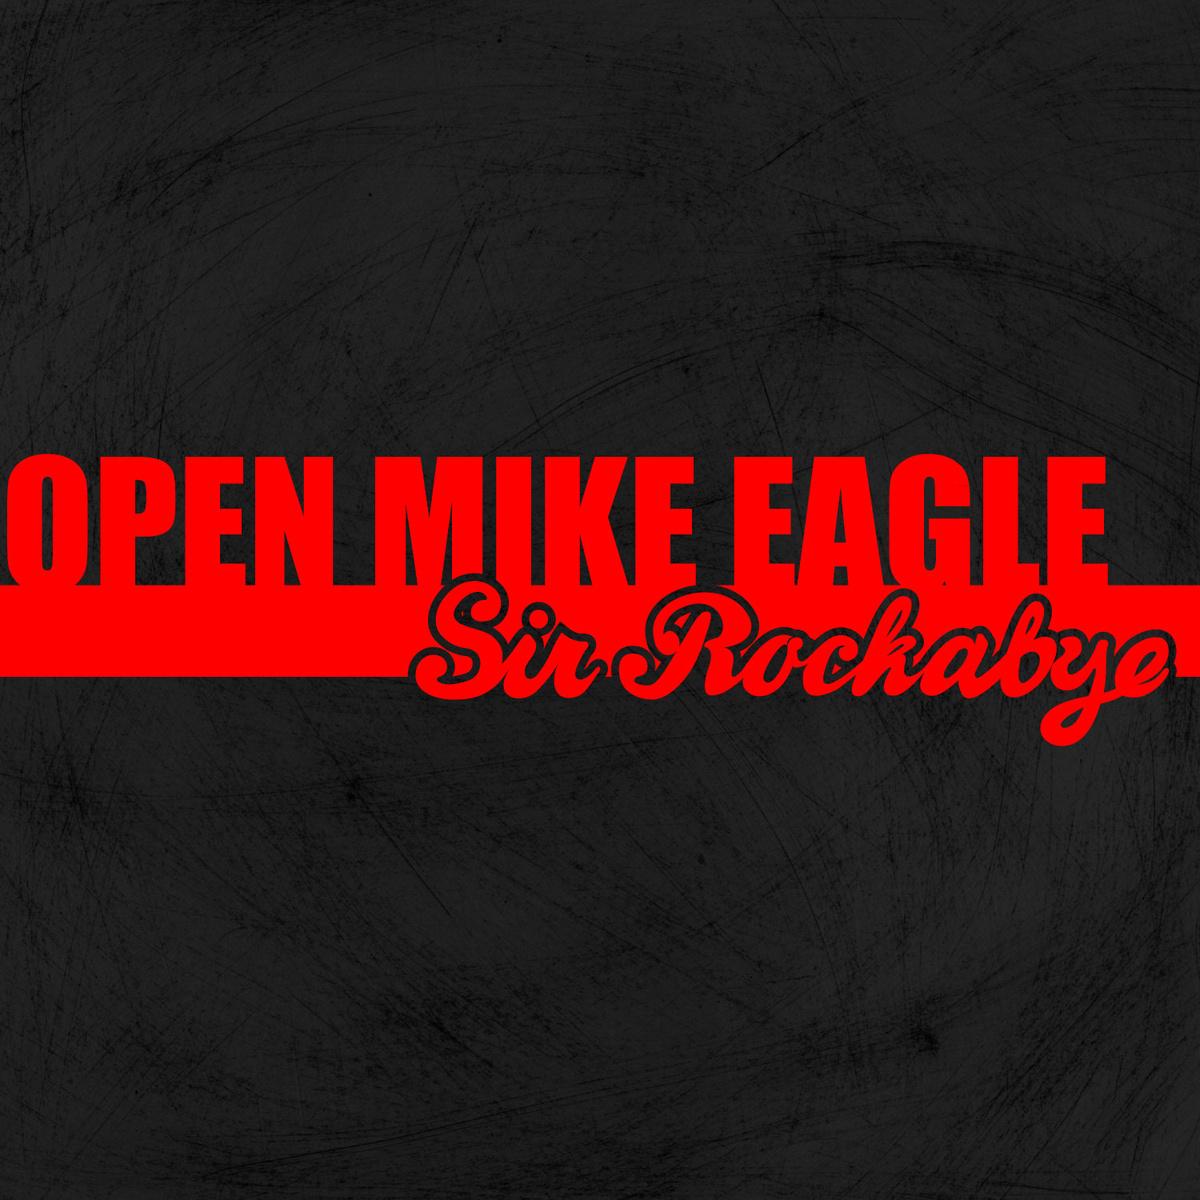 Open Mike Eagle Sir Rockabye